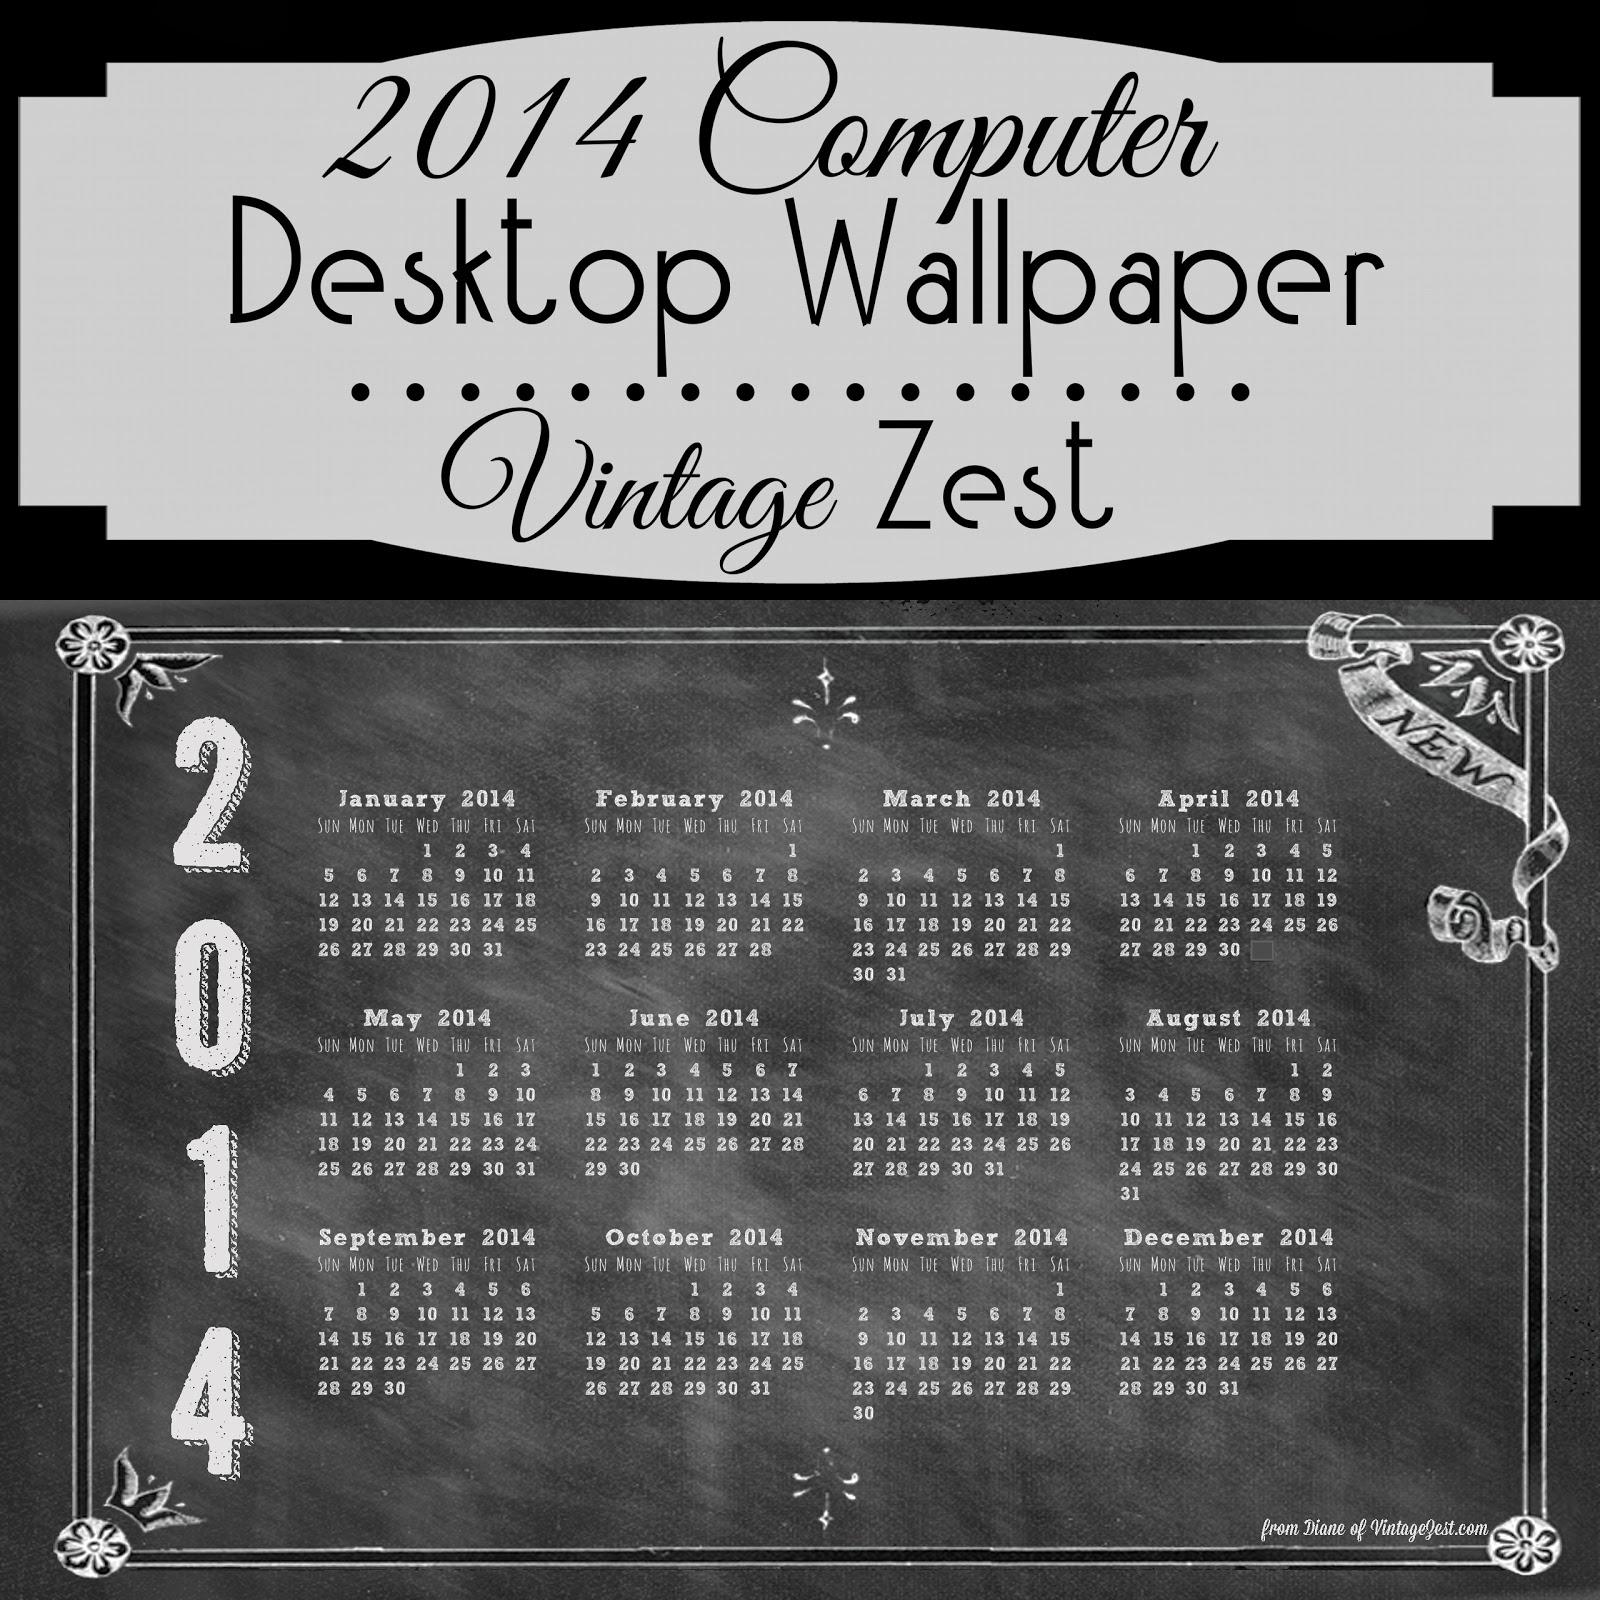 Desktop Wallpaper January 2014: 2014 Computer Desktop Wallpaper Download